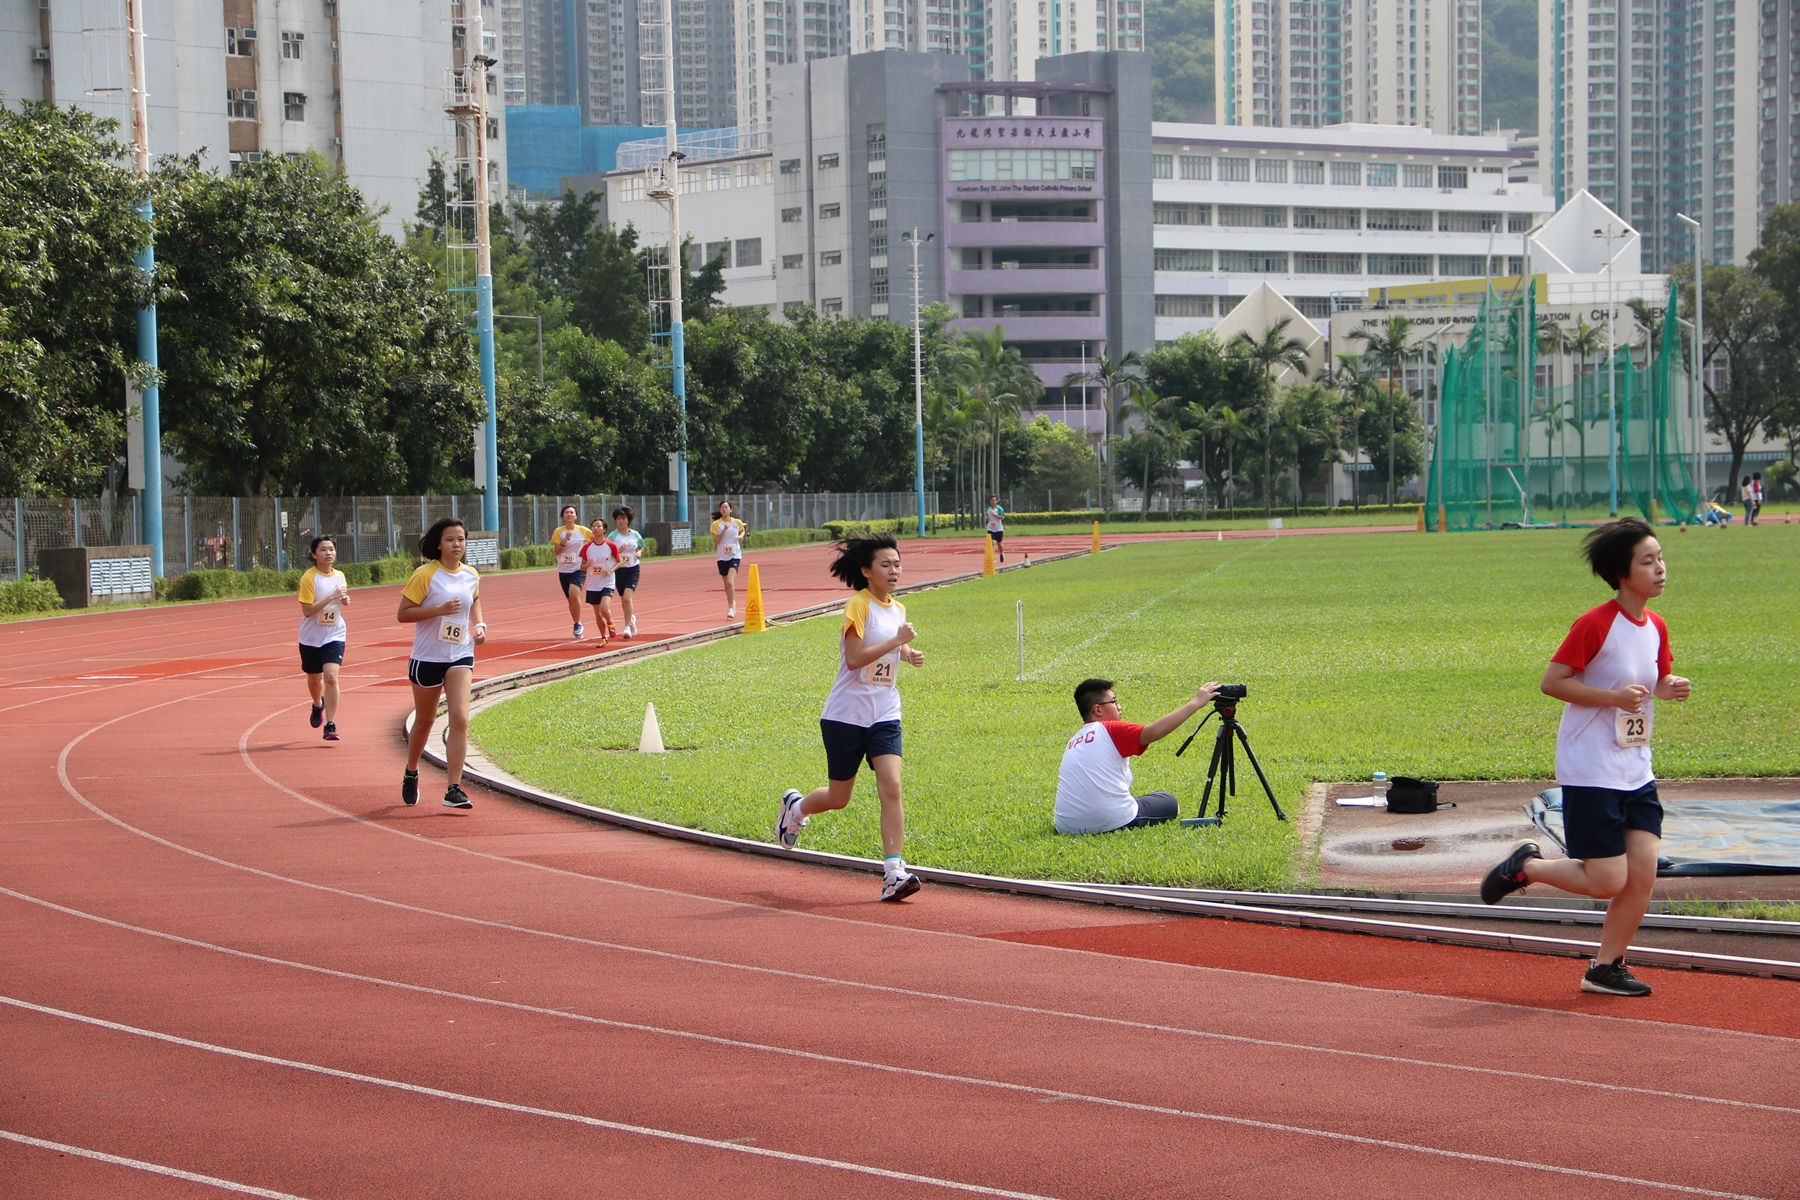 http://npc.edu.hk/sites/default/files/img_4776.jpg